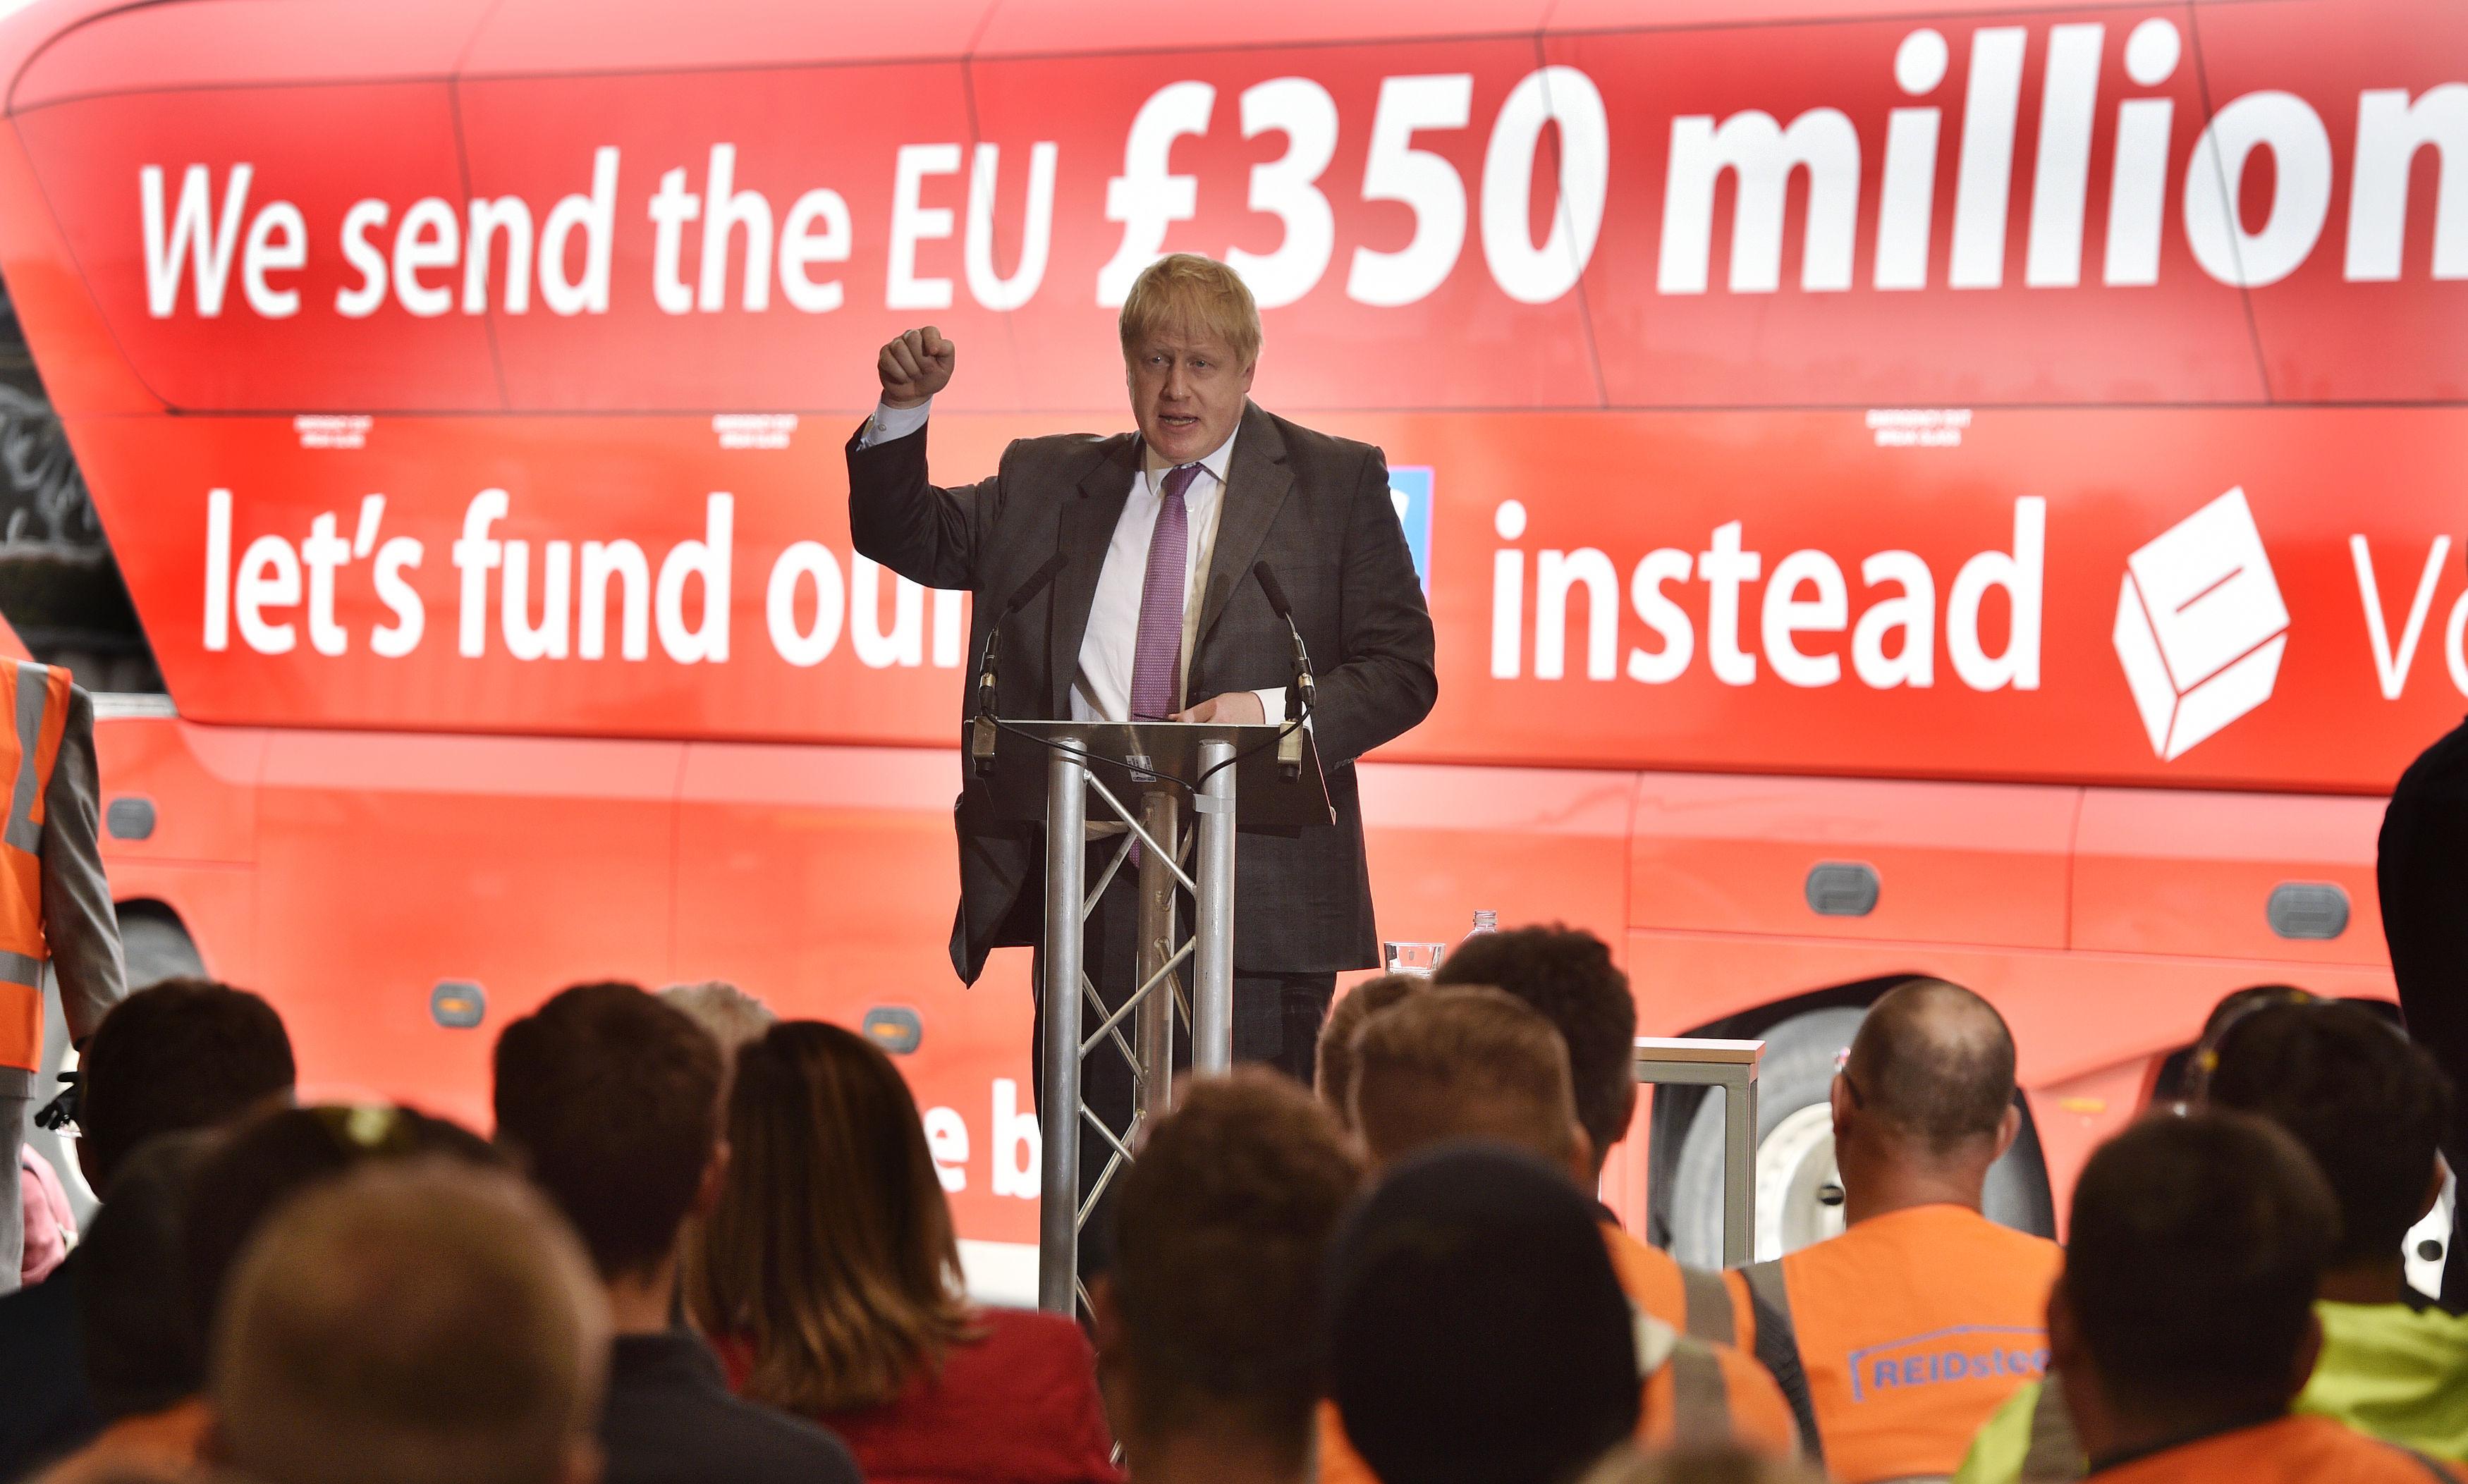 Former Mayor of London Boris Johnson speaks to employees during a visit to Reid Steel, Christchurch, Dorset, ahead of the June 23 referendum.